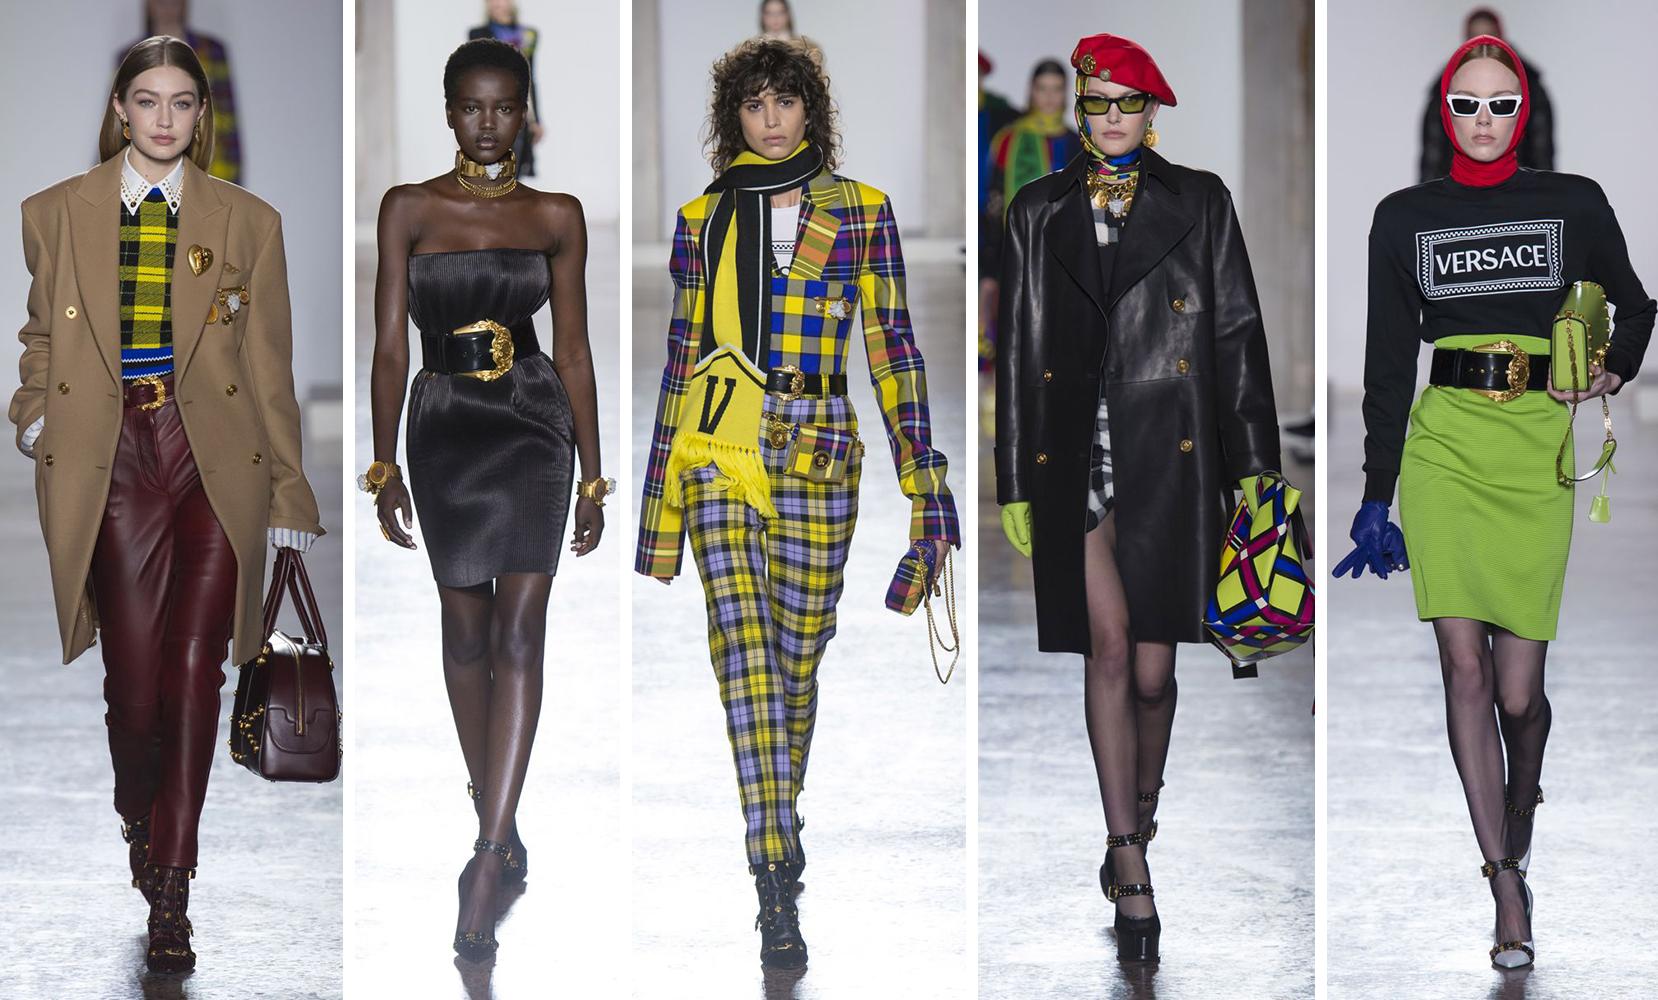 versace_oszi-teli_ready-to-wear_kollekcio_2018_milanoi_divathet.png